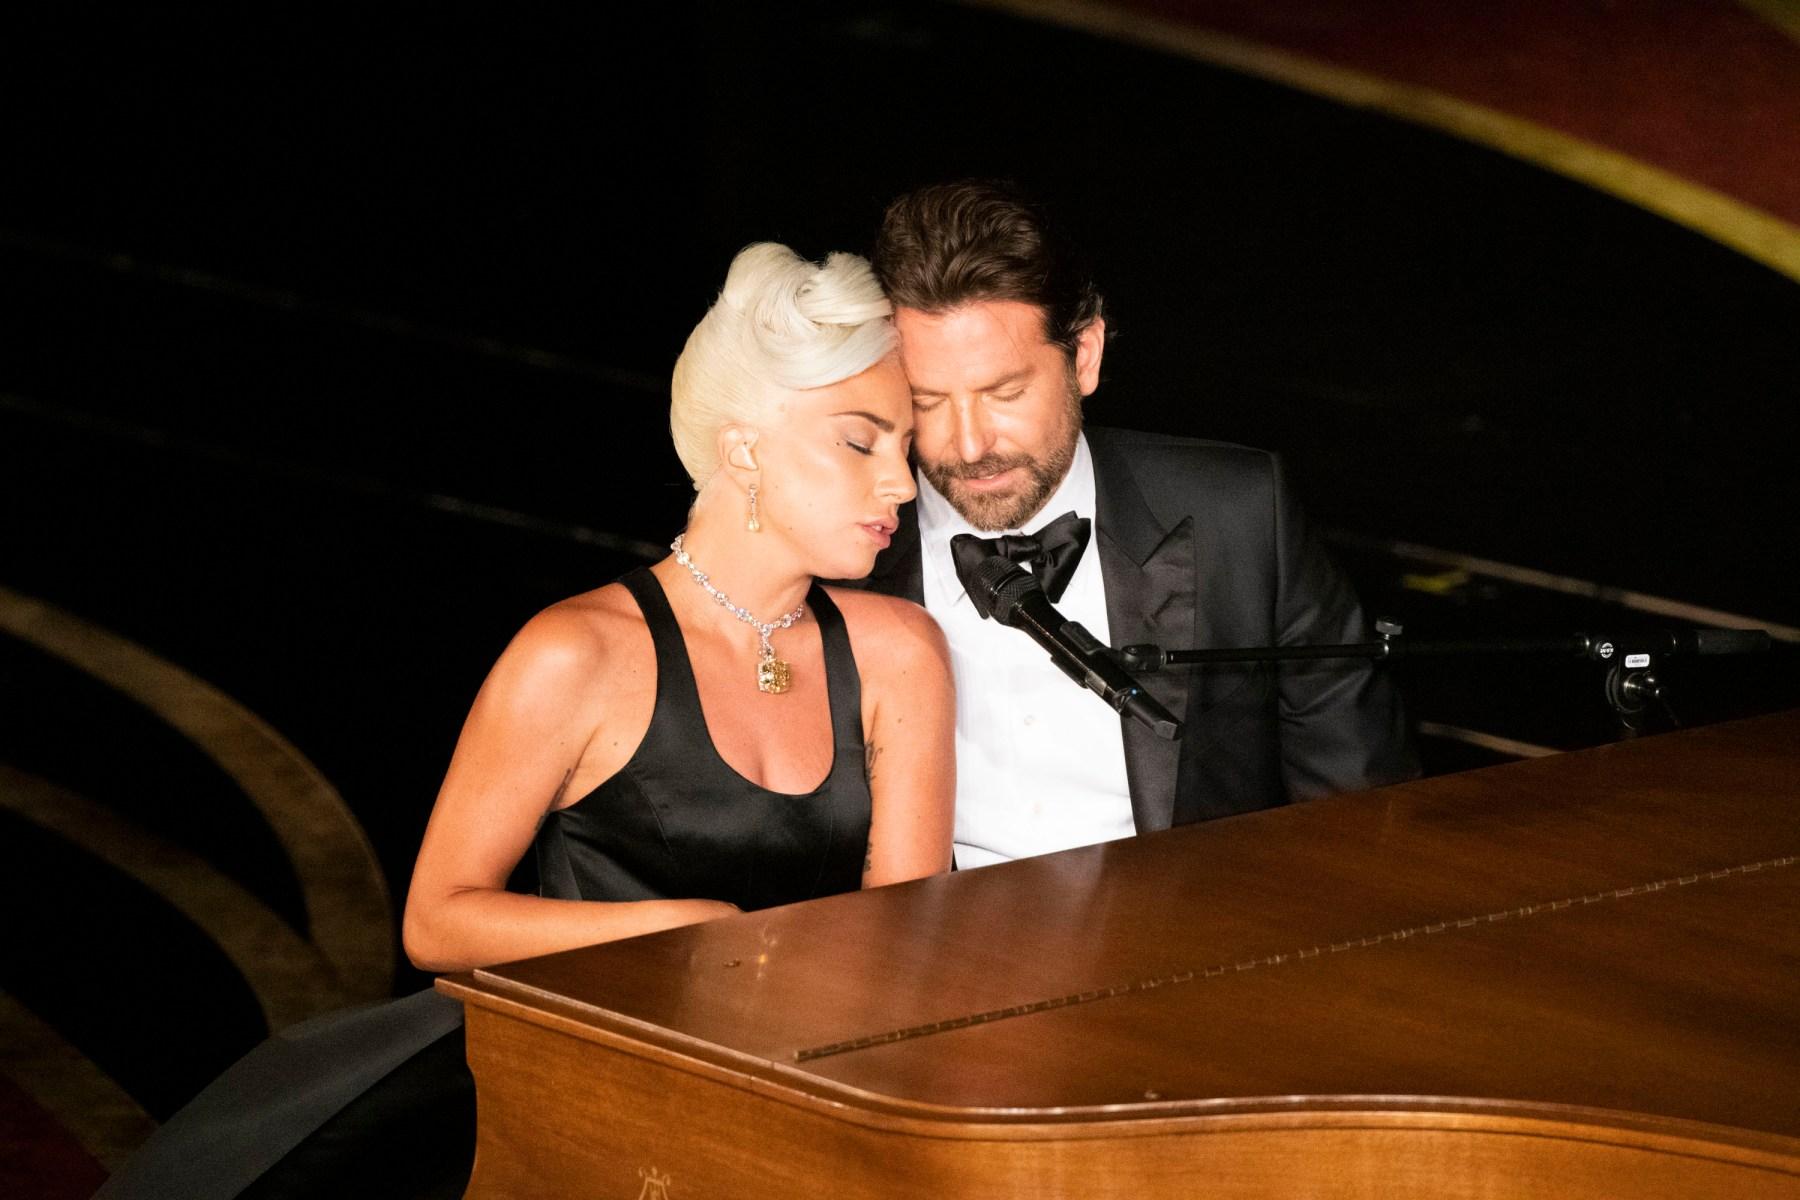 Cooper Gaga Oscars performance